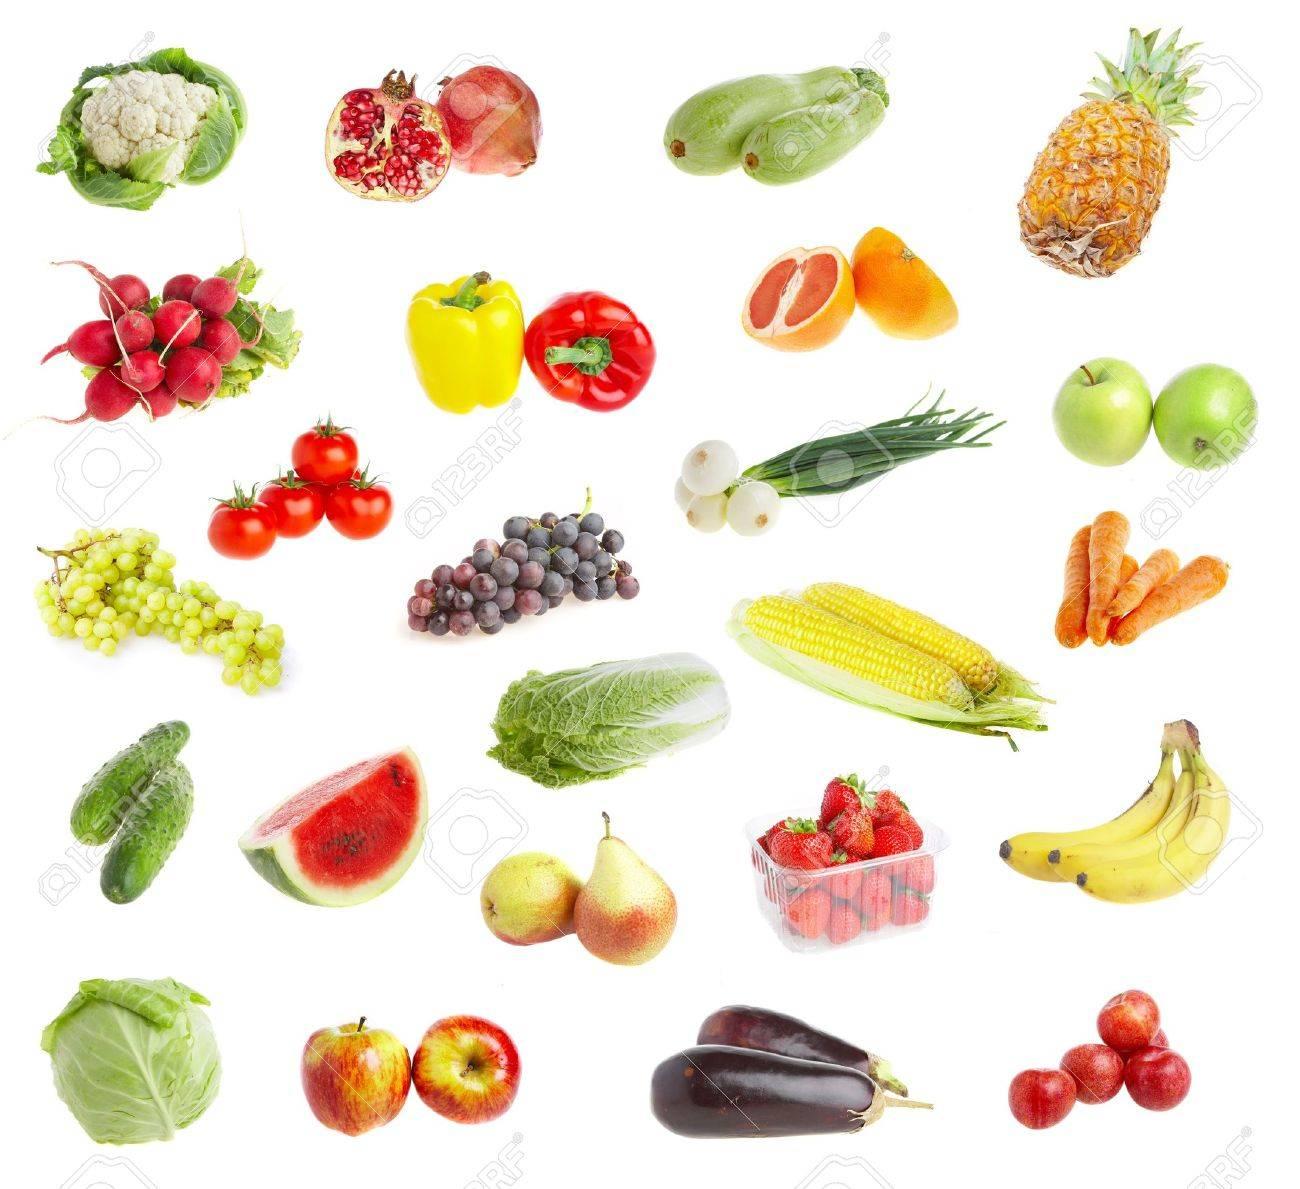 Ripe freshs fruit andvegetables. Wholesome food. Stock Photo - 2362135